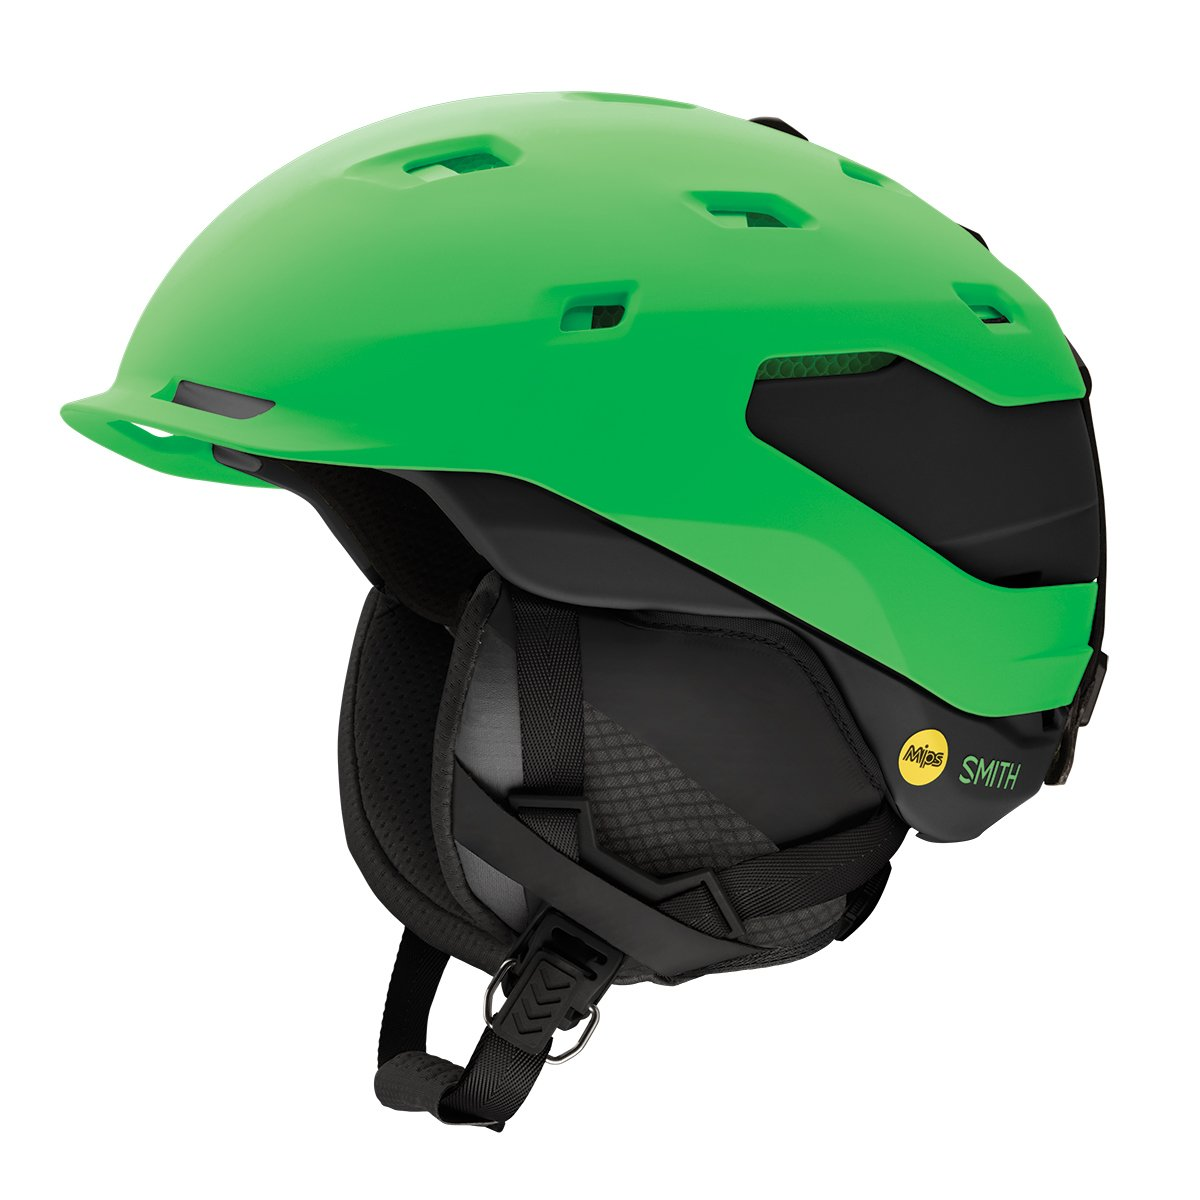 Smith Quantum Mips Snow Helmet - Matte Reactor Black (Large) by Smith Optics